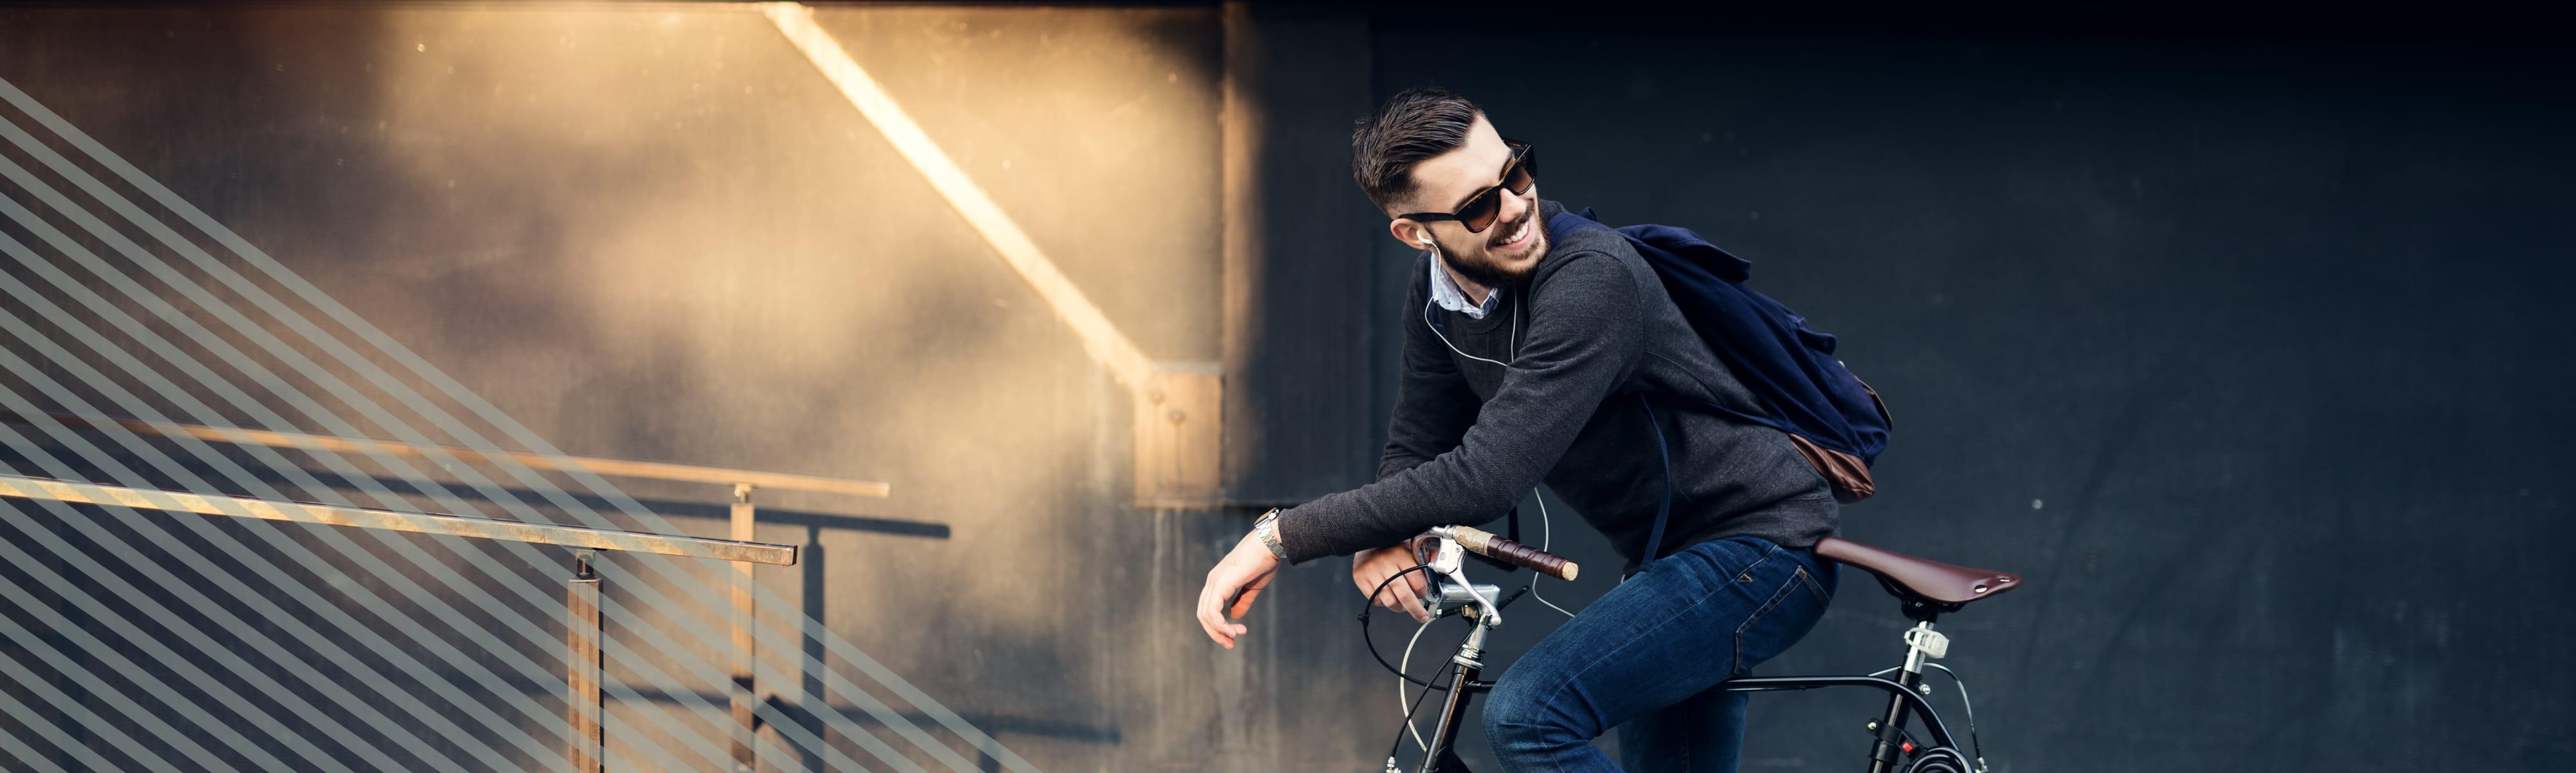 Man riding bike in Austin near Alta Tech Ridge